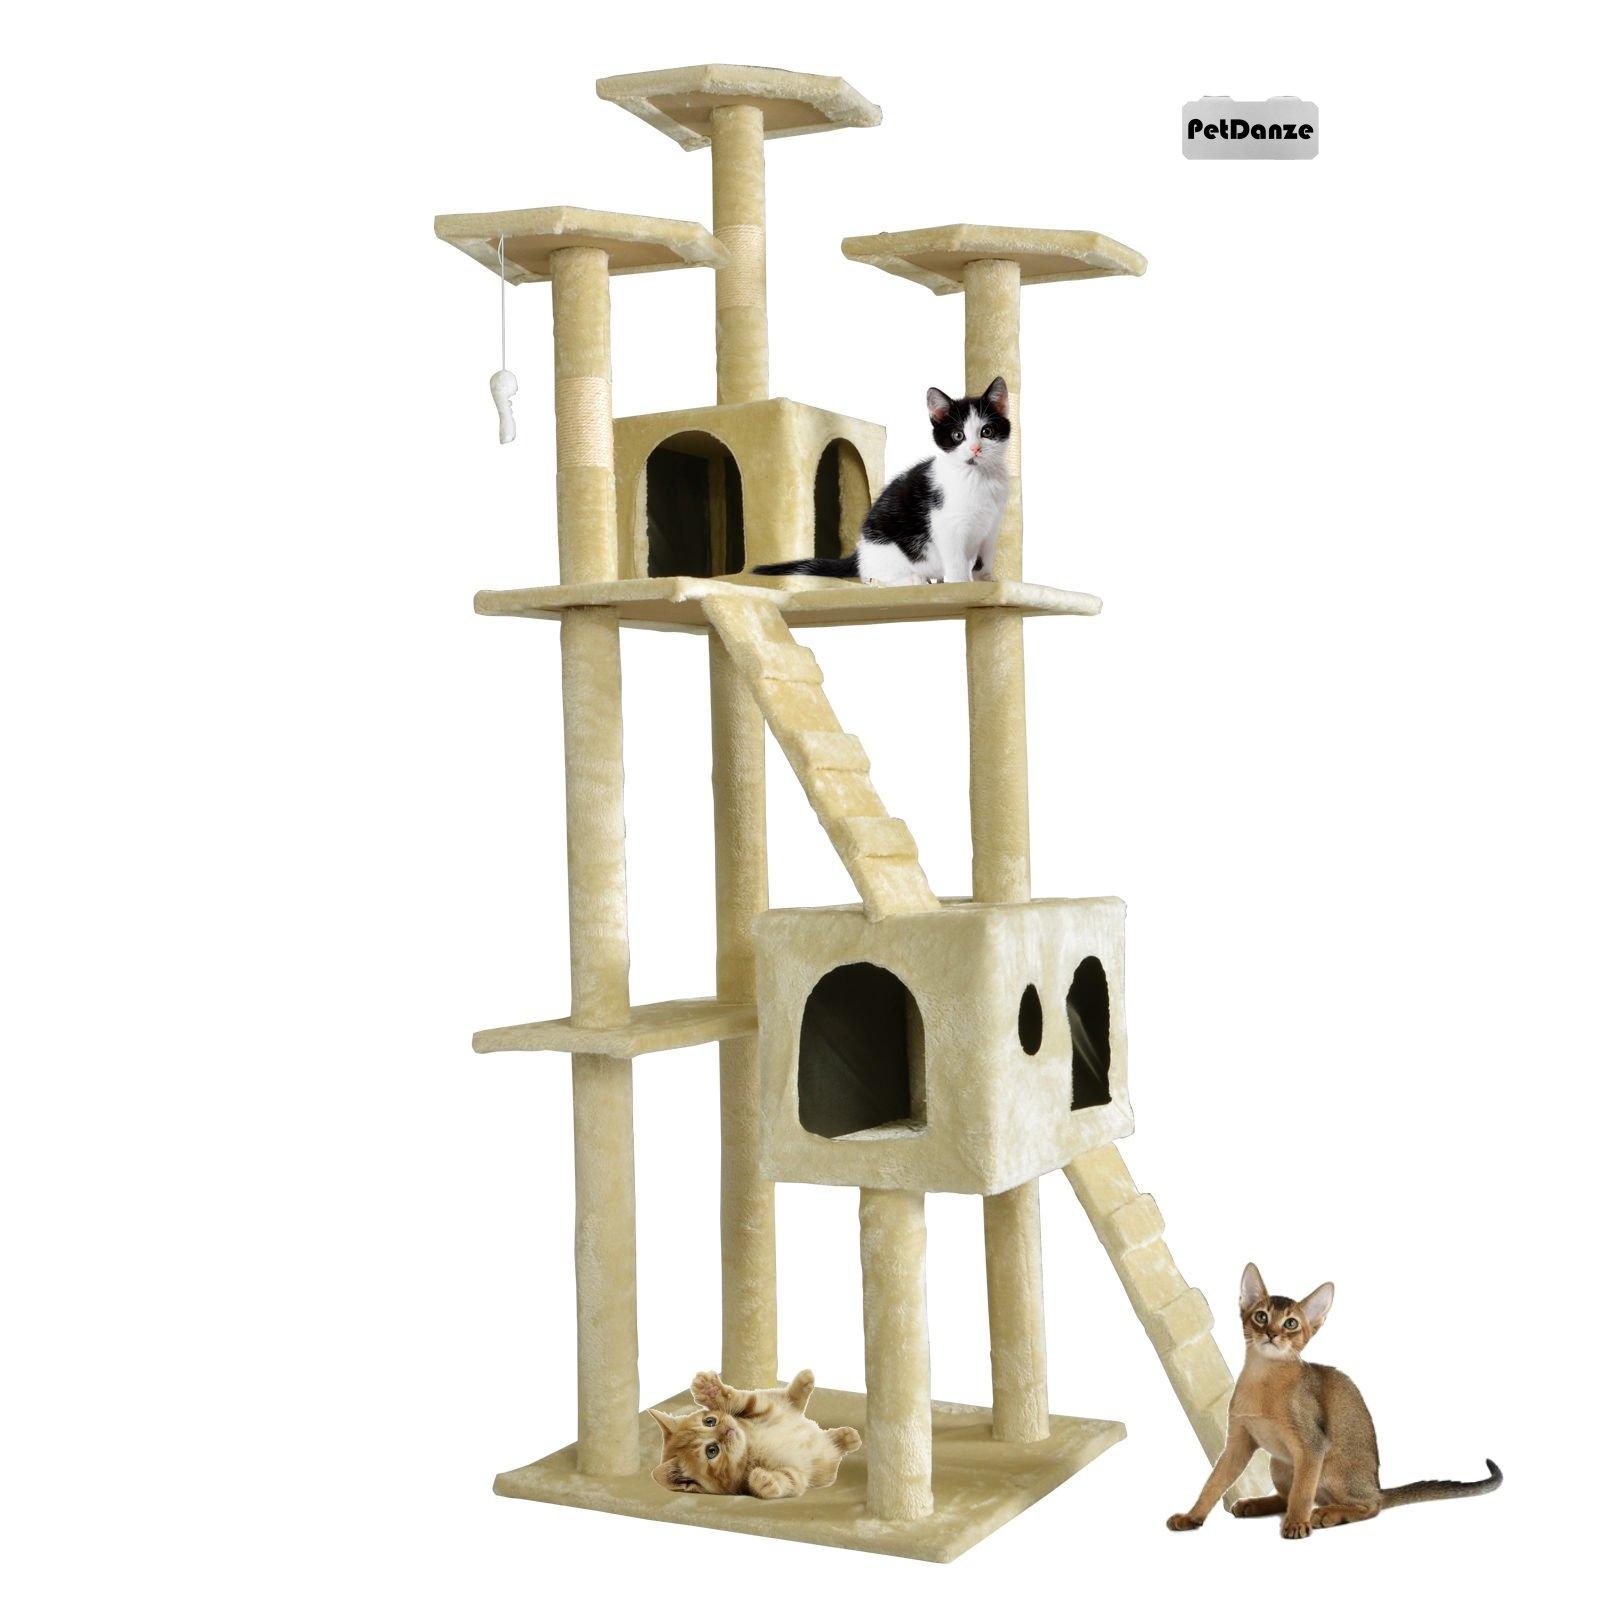 PetDanze Cat Tree Kitten Condo Post Scratcher | Kitty Tower Scratching Post Furniture | Cat Climbers Play House | 73'' Height, Beige